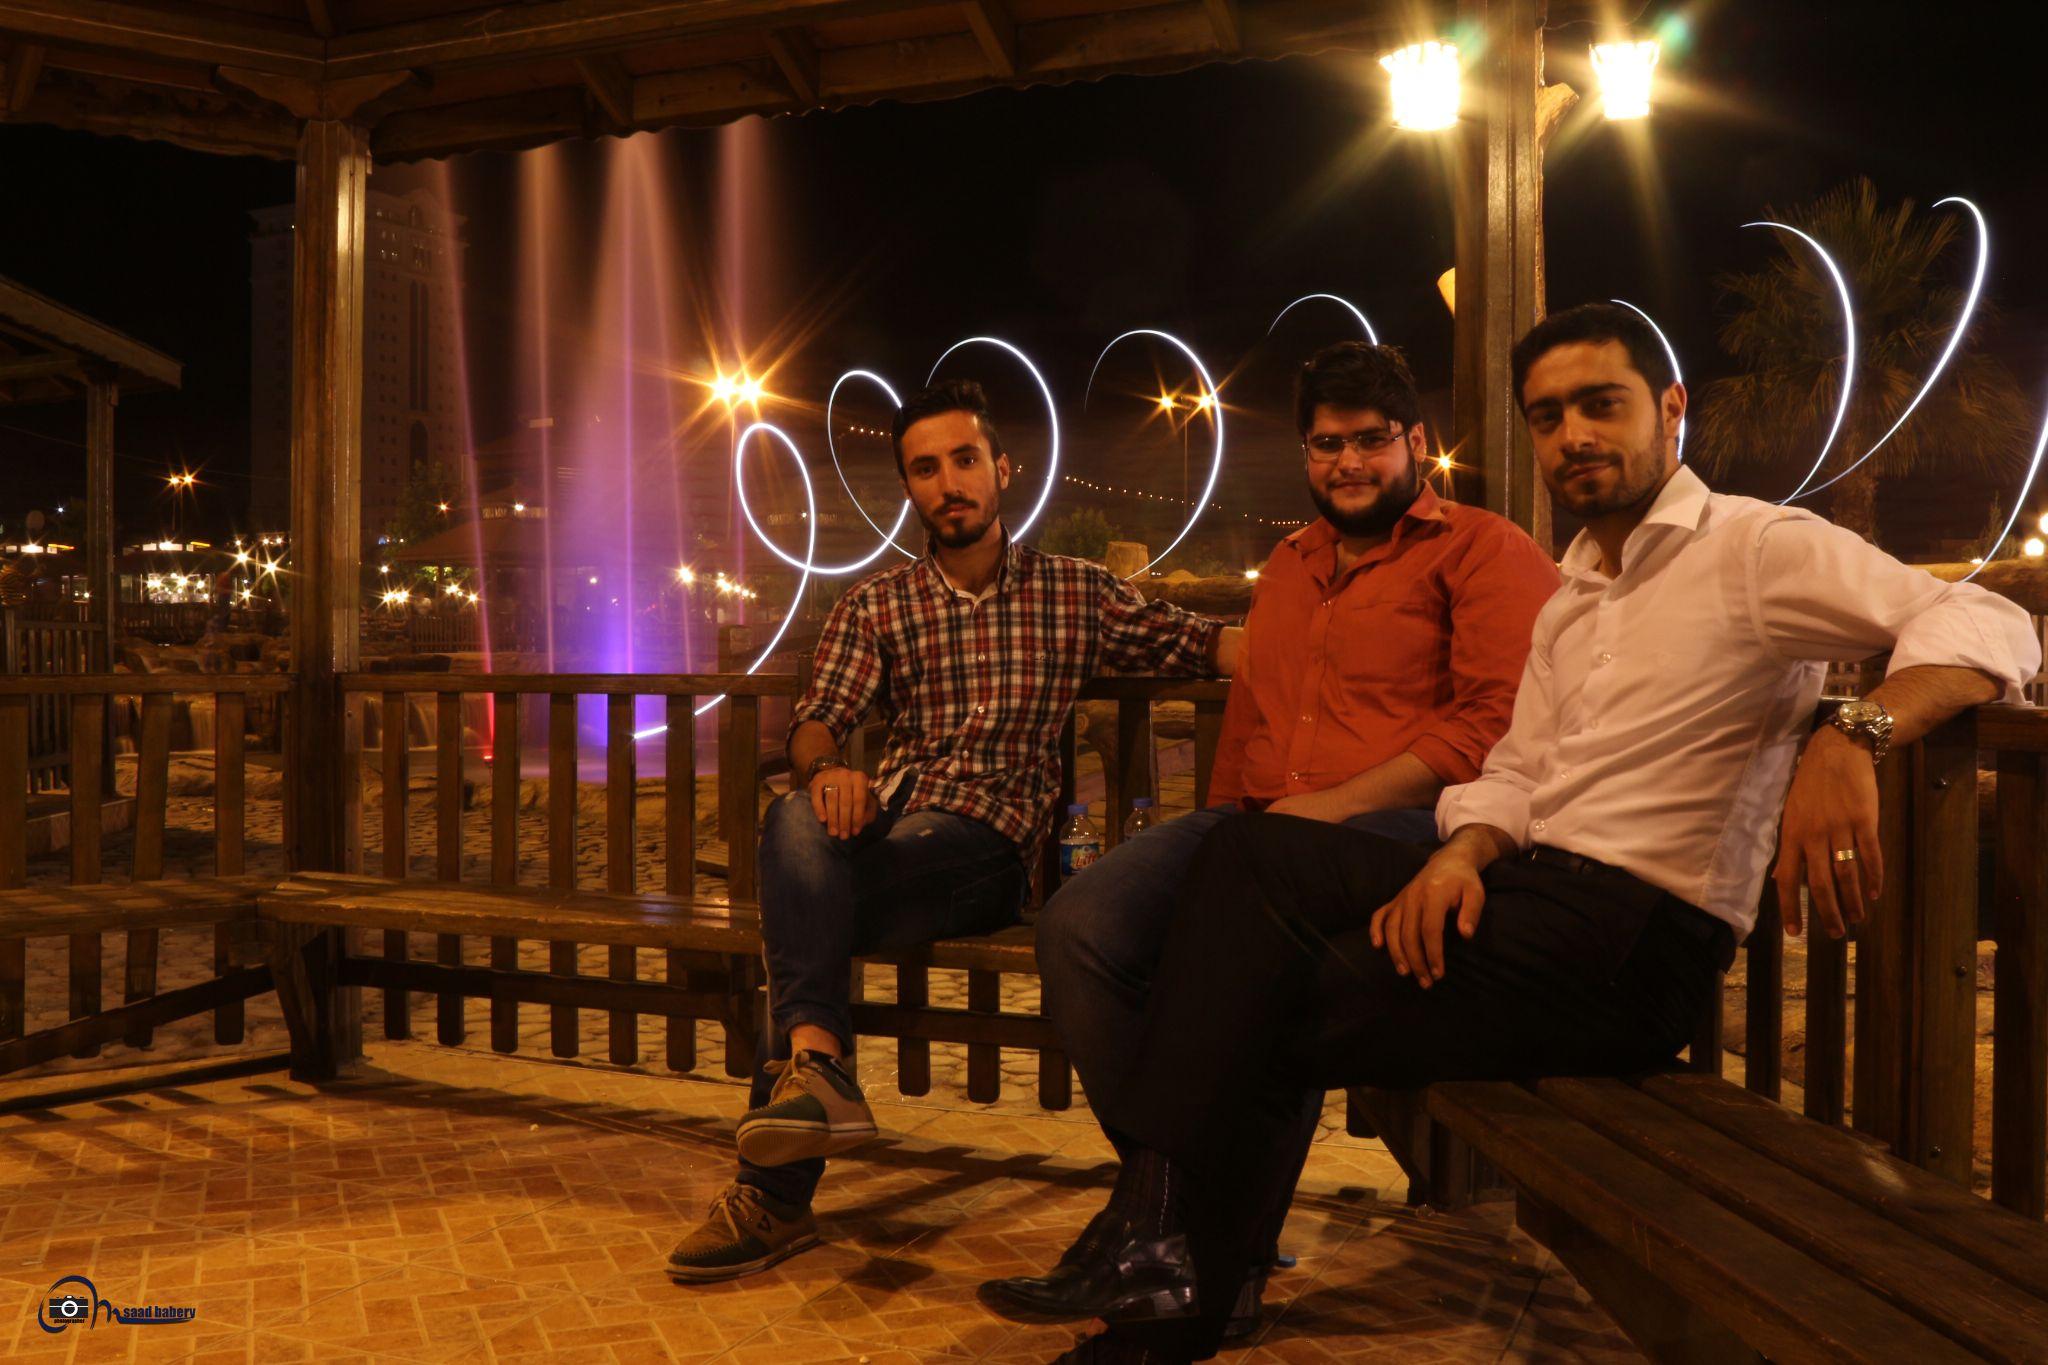 photo saad babery (177) by Saad Babery